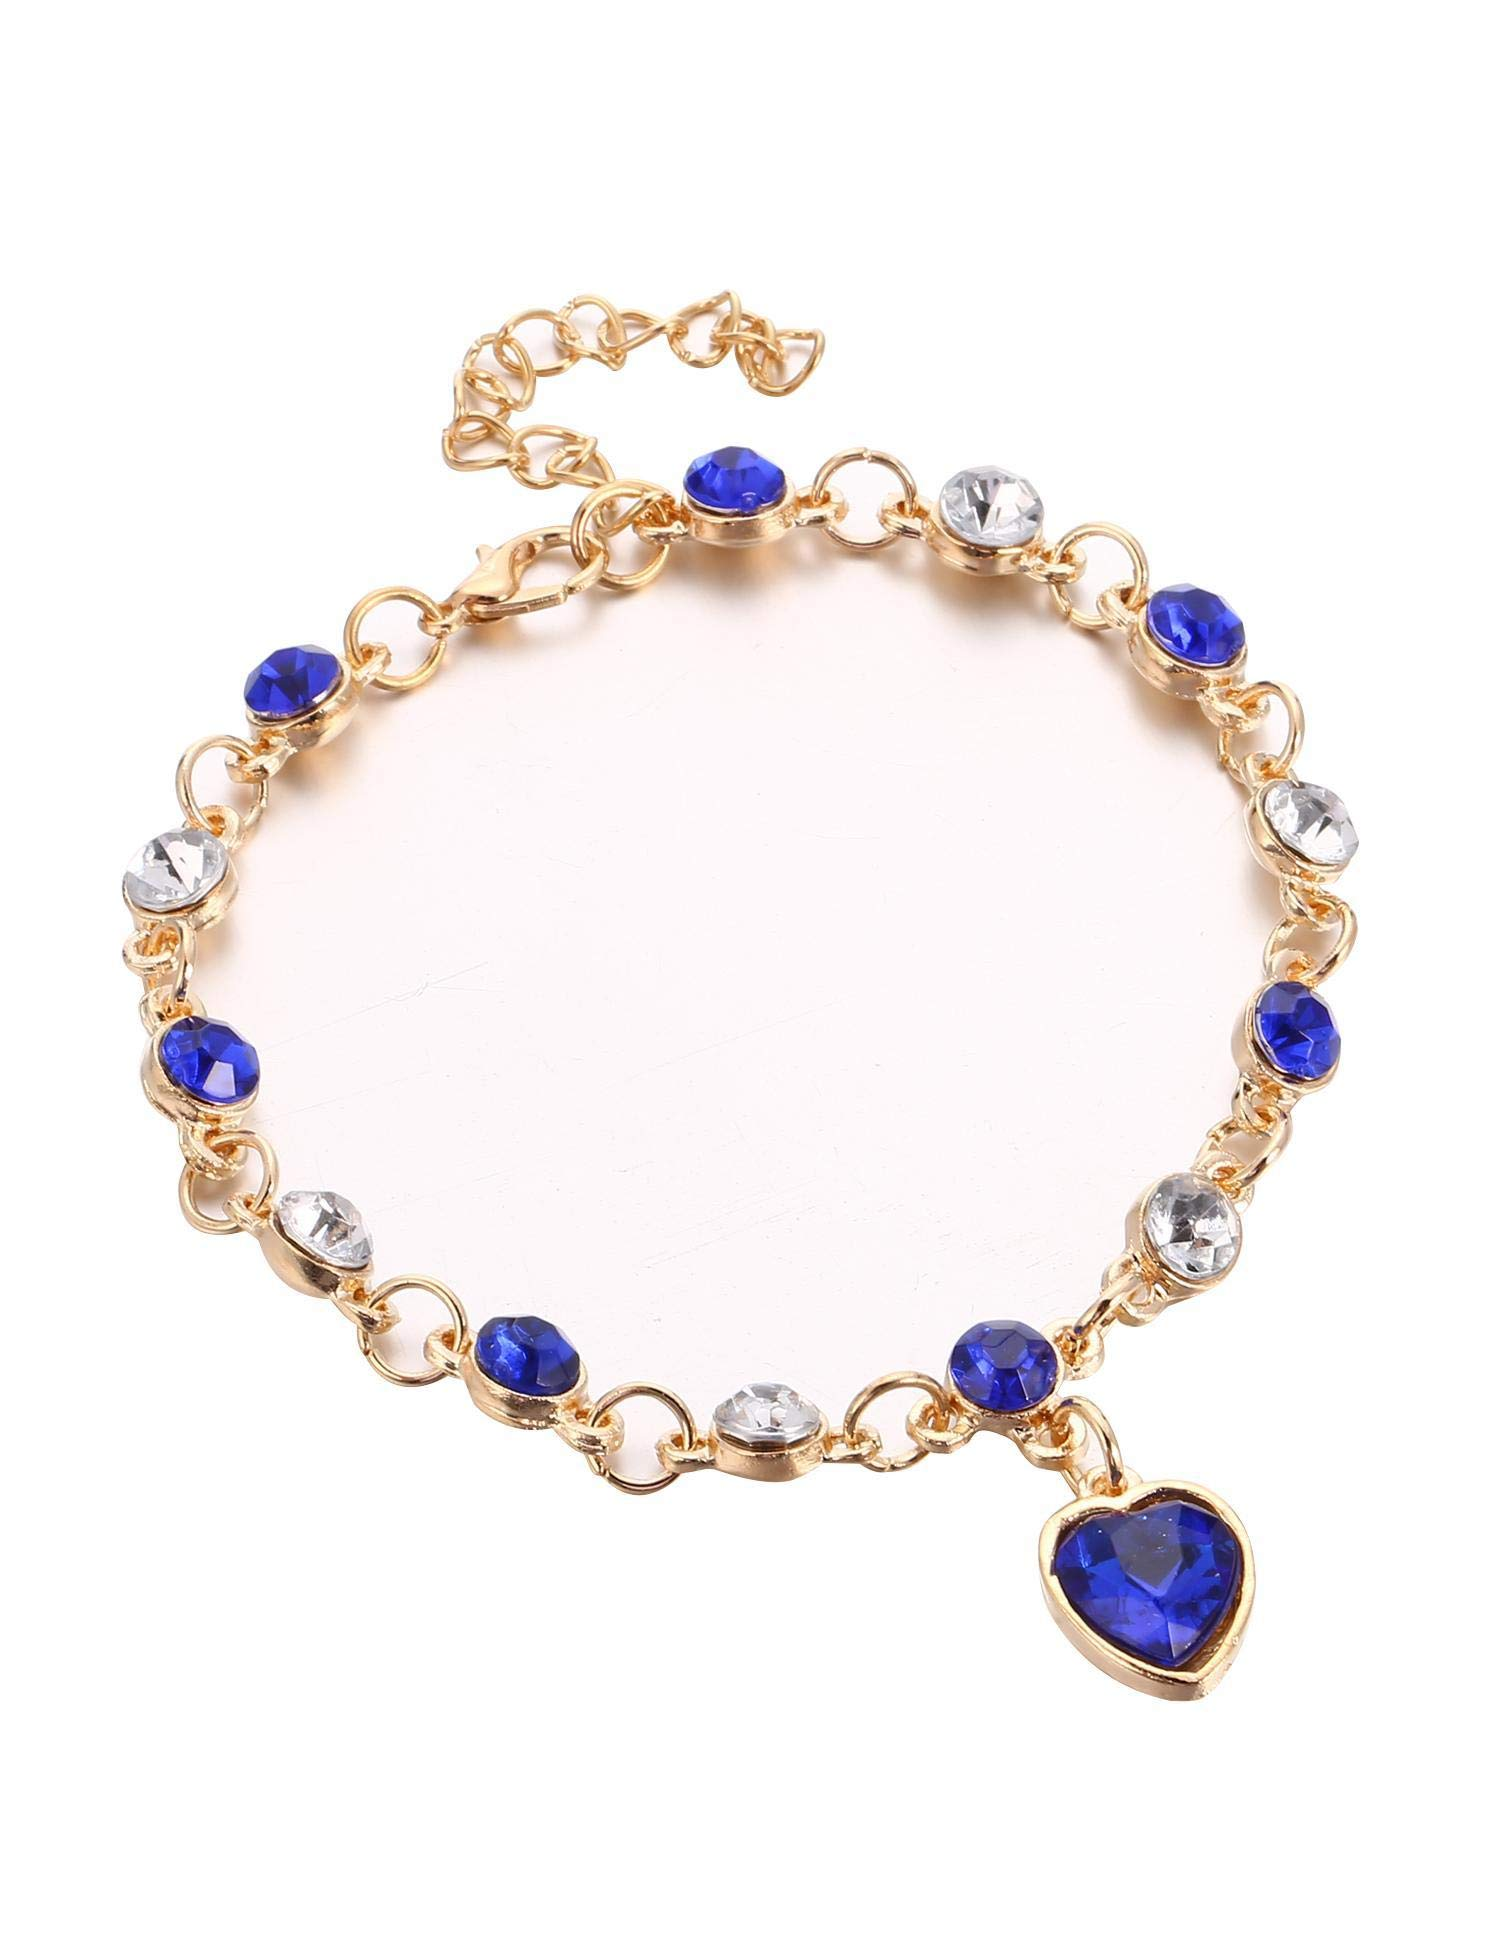 Bracelets Jewelry Love Heart Pendant Rhinestone Crystal Rose Gold Plated Bracelet for Women Girls for Her